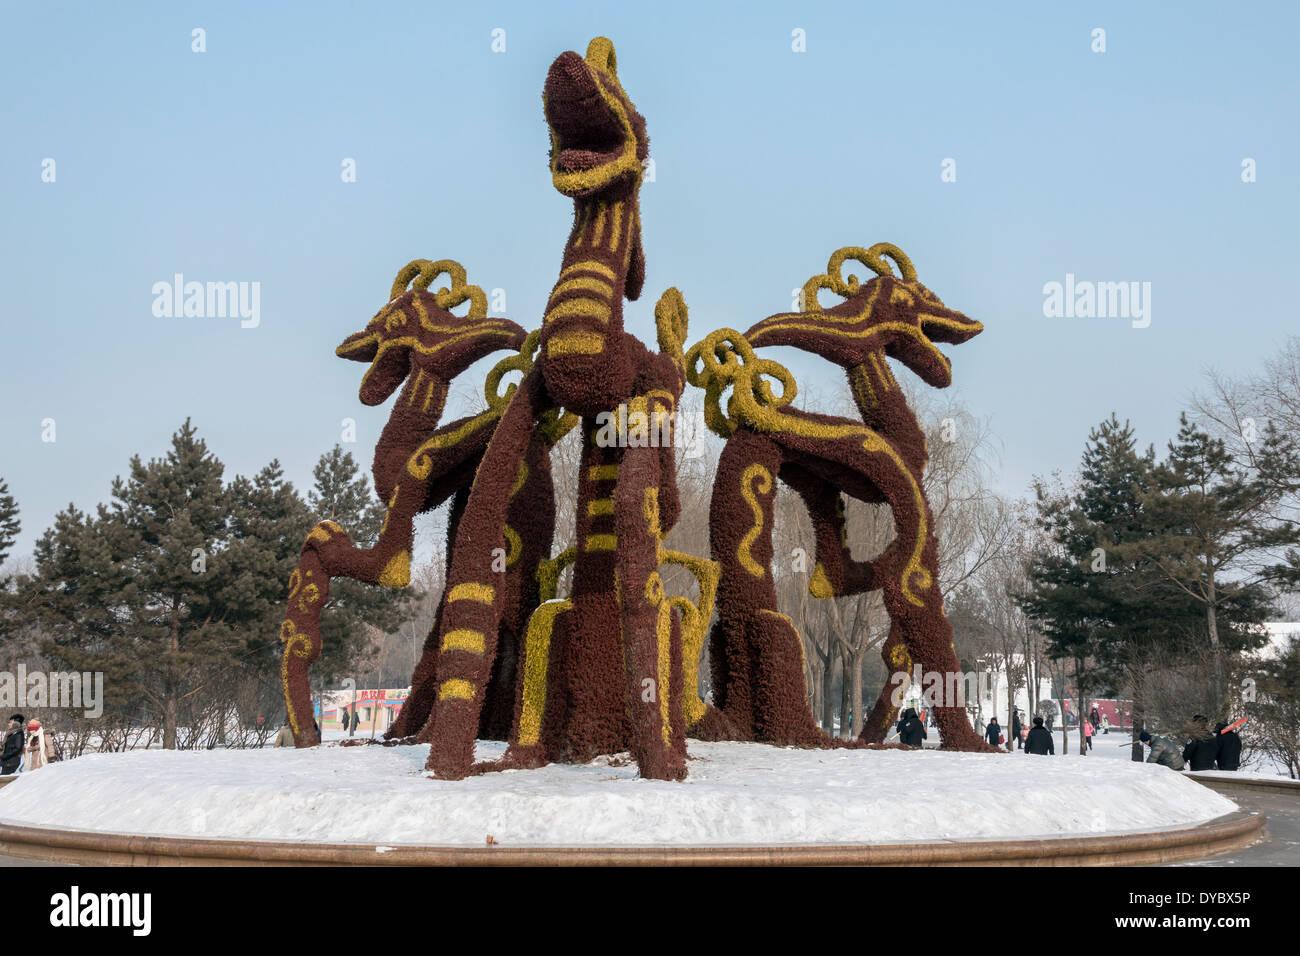 Mythical creatures snow sculpture, Harbin International Snow Sculpture Art Expo, China - Stock Image